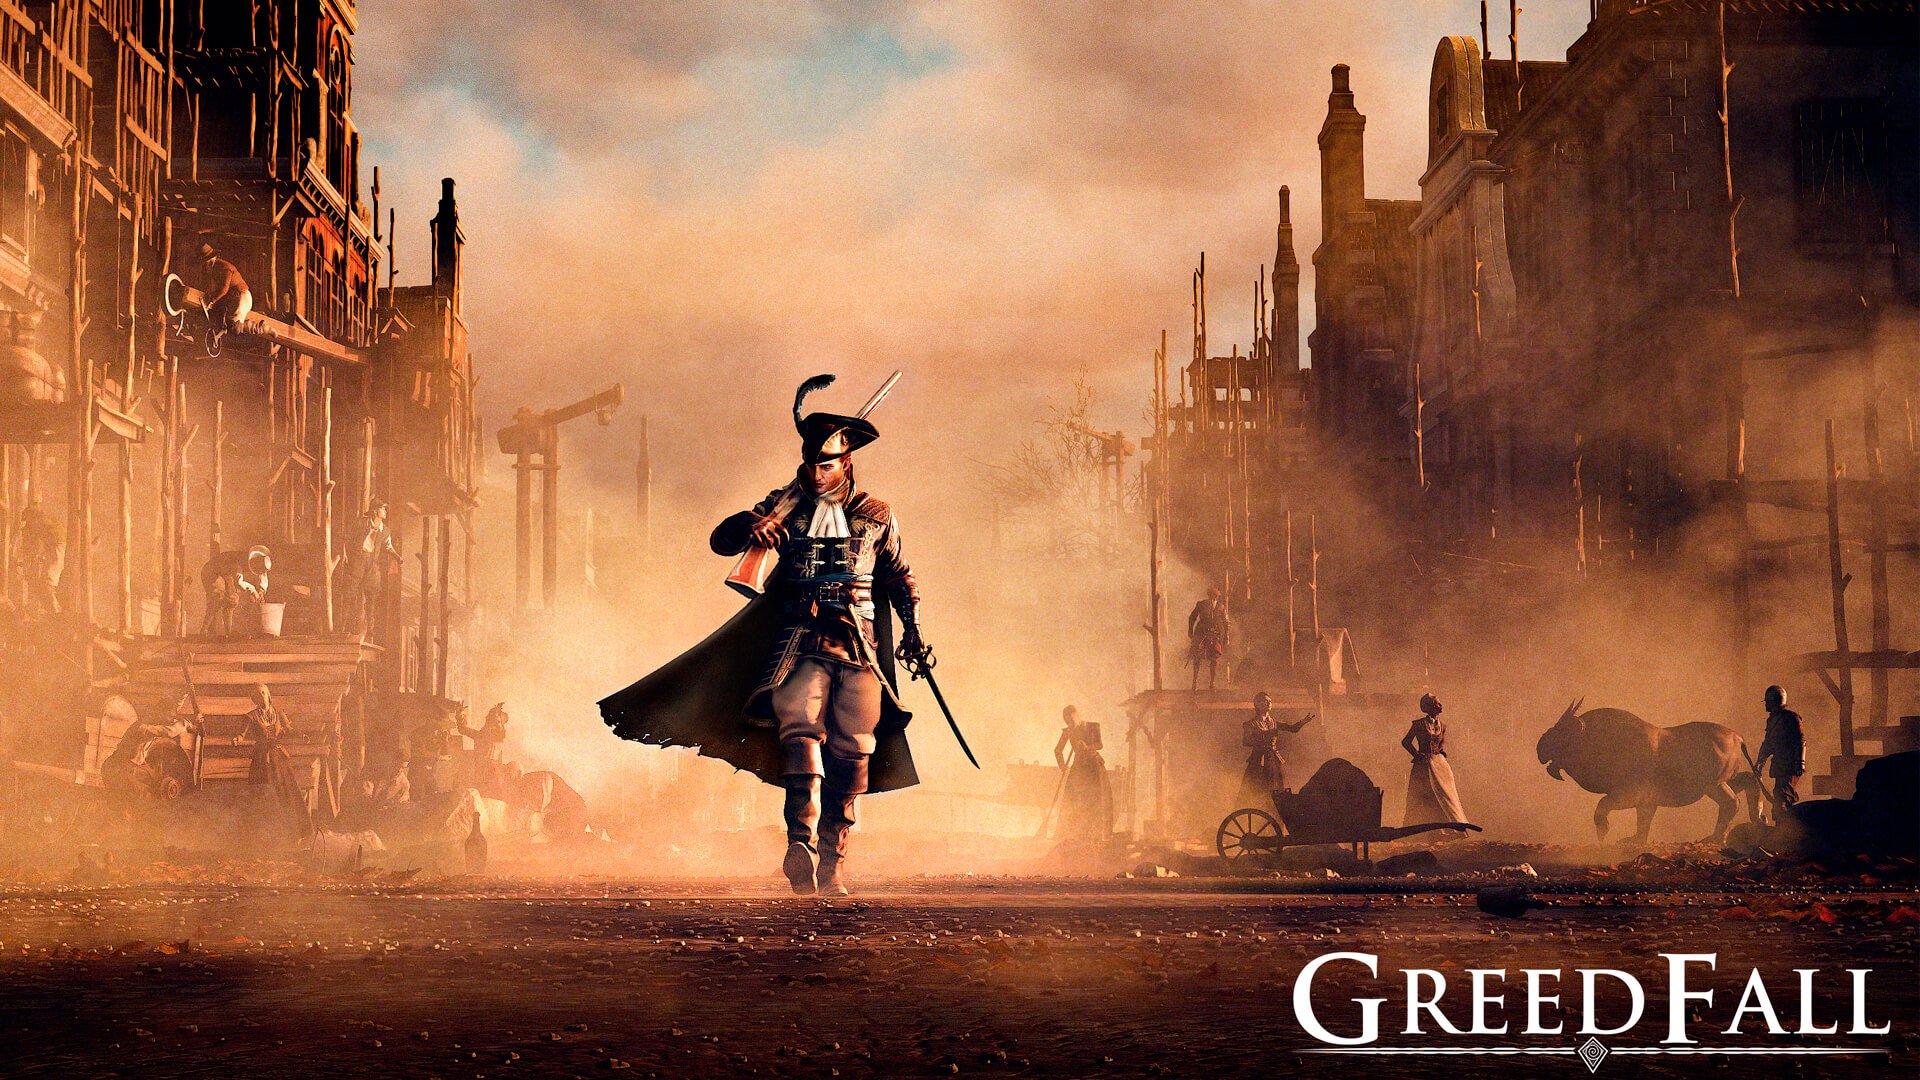 greedfall wallpaper 68577